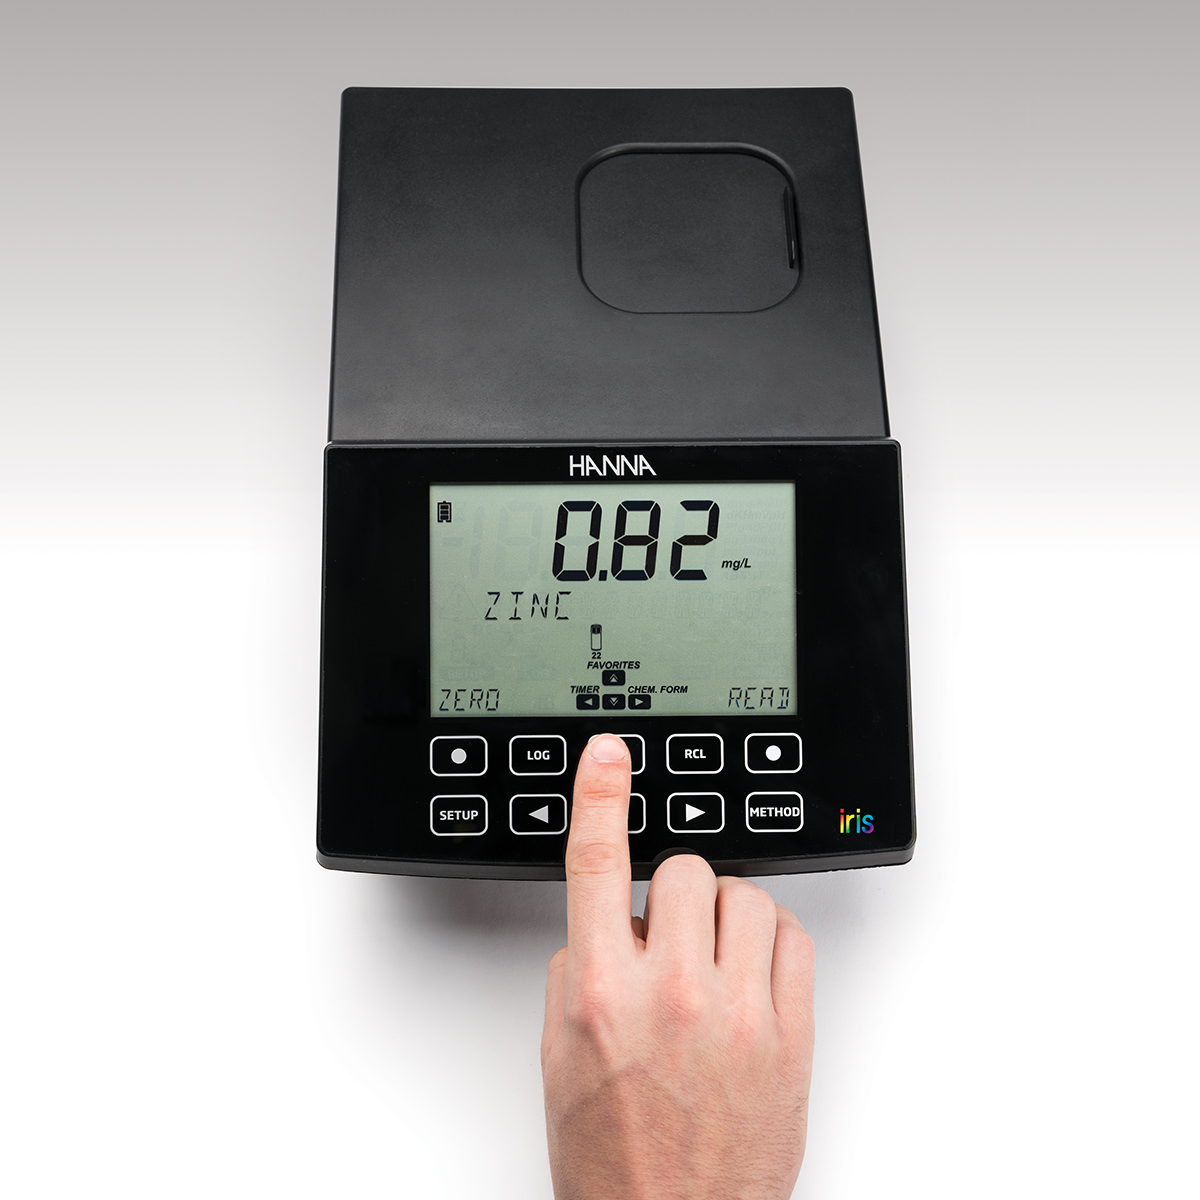 iris spectrophotometer